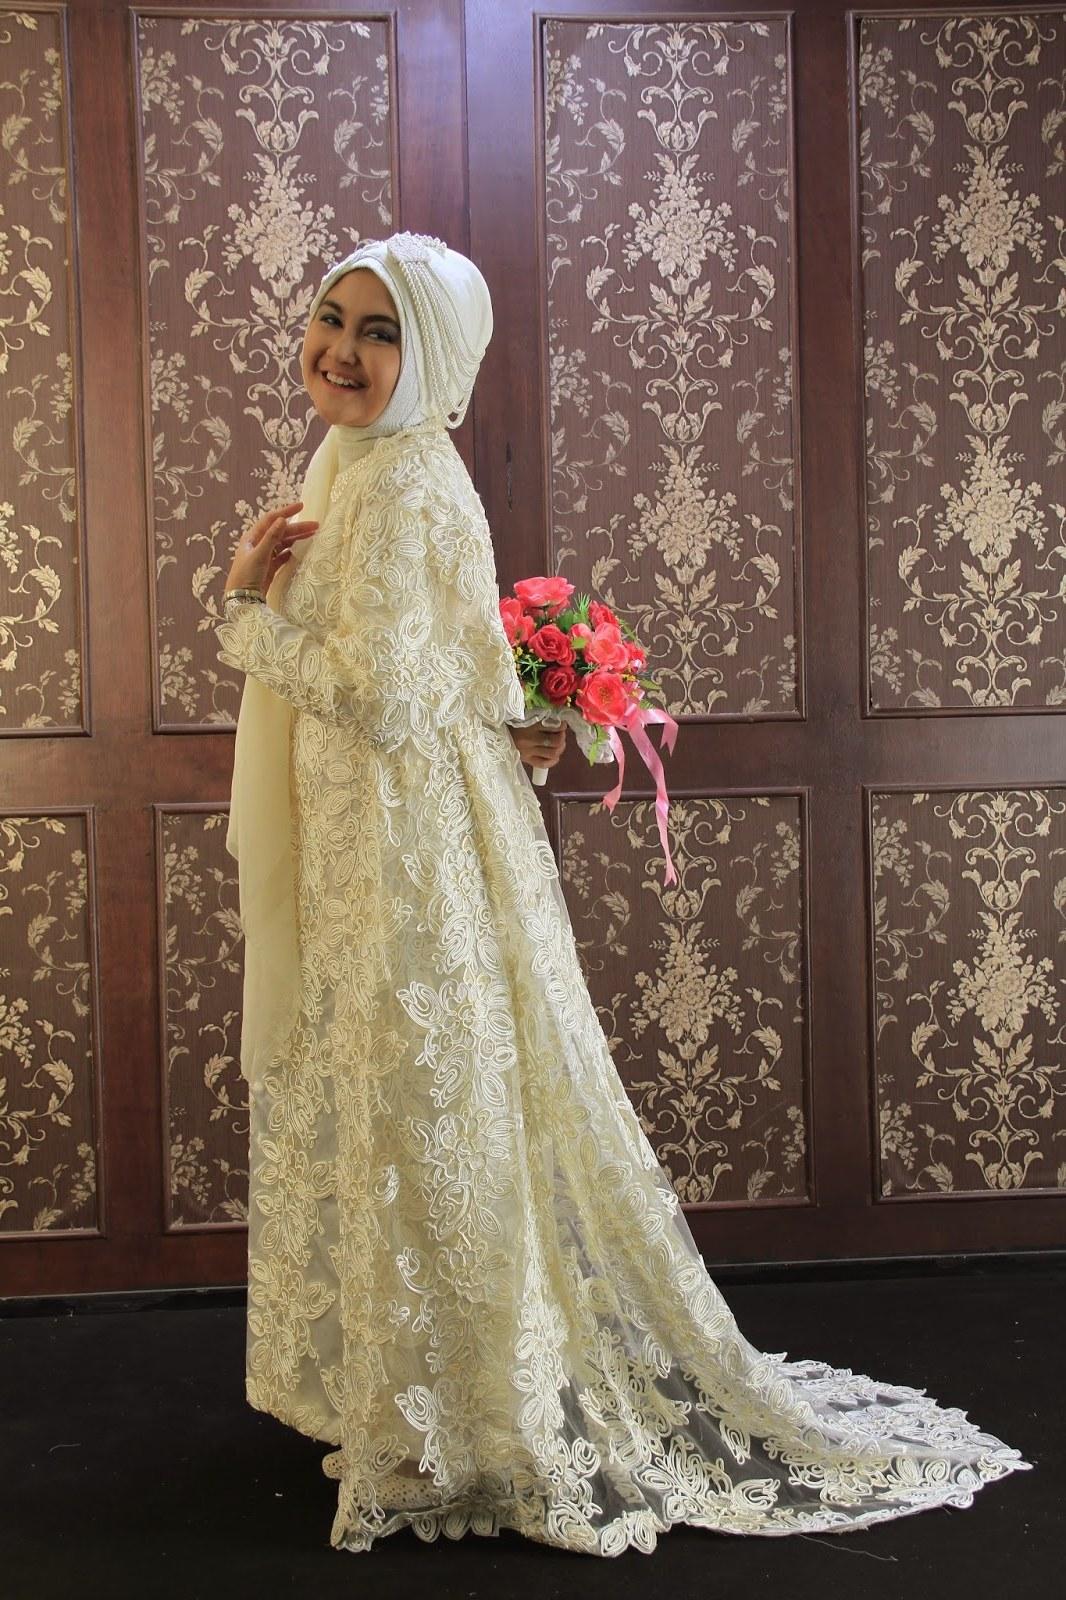 Bentuk Busana Pengantin Muslim, Busana Pengantin Muslimah X8d1 Padme Wedding Dress Replica – Fashion Dresses